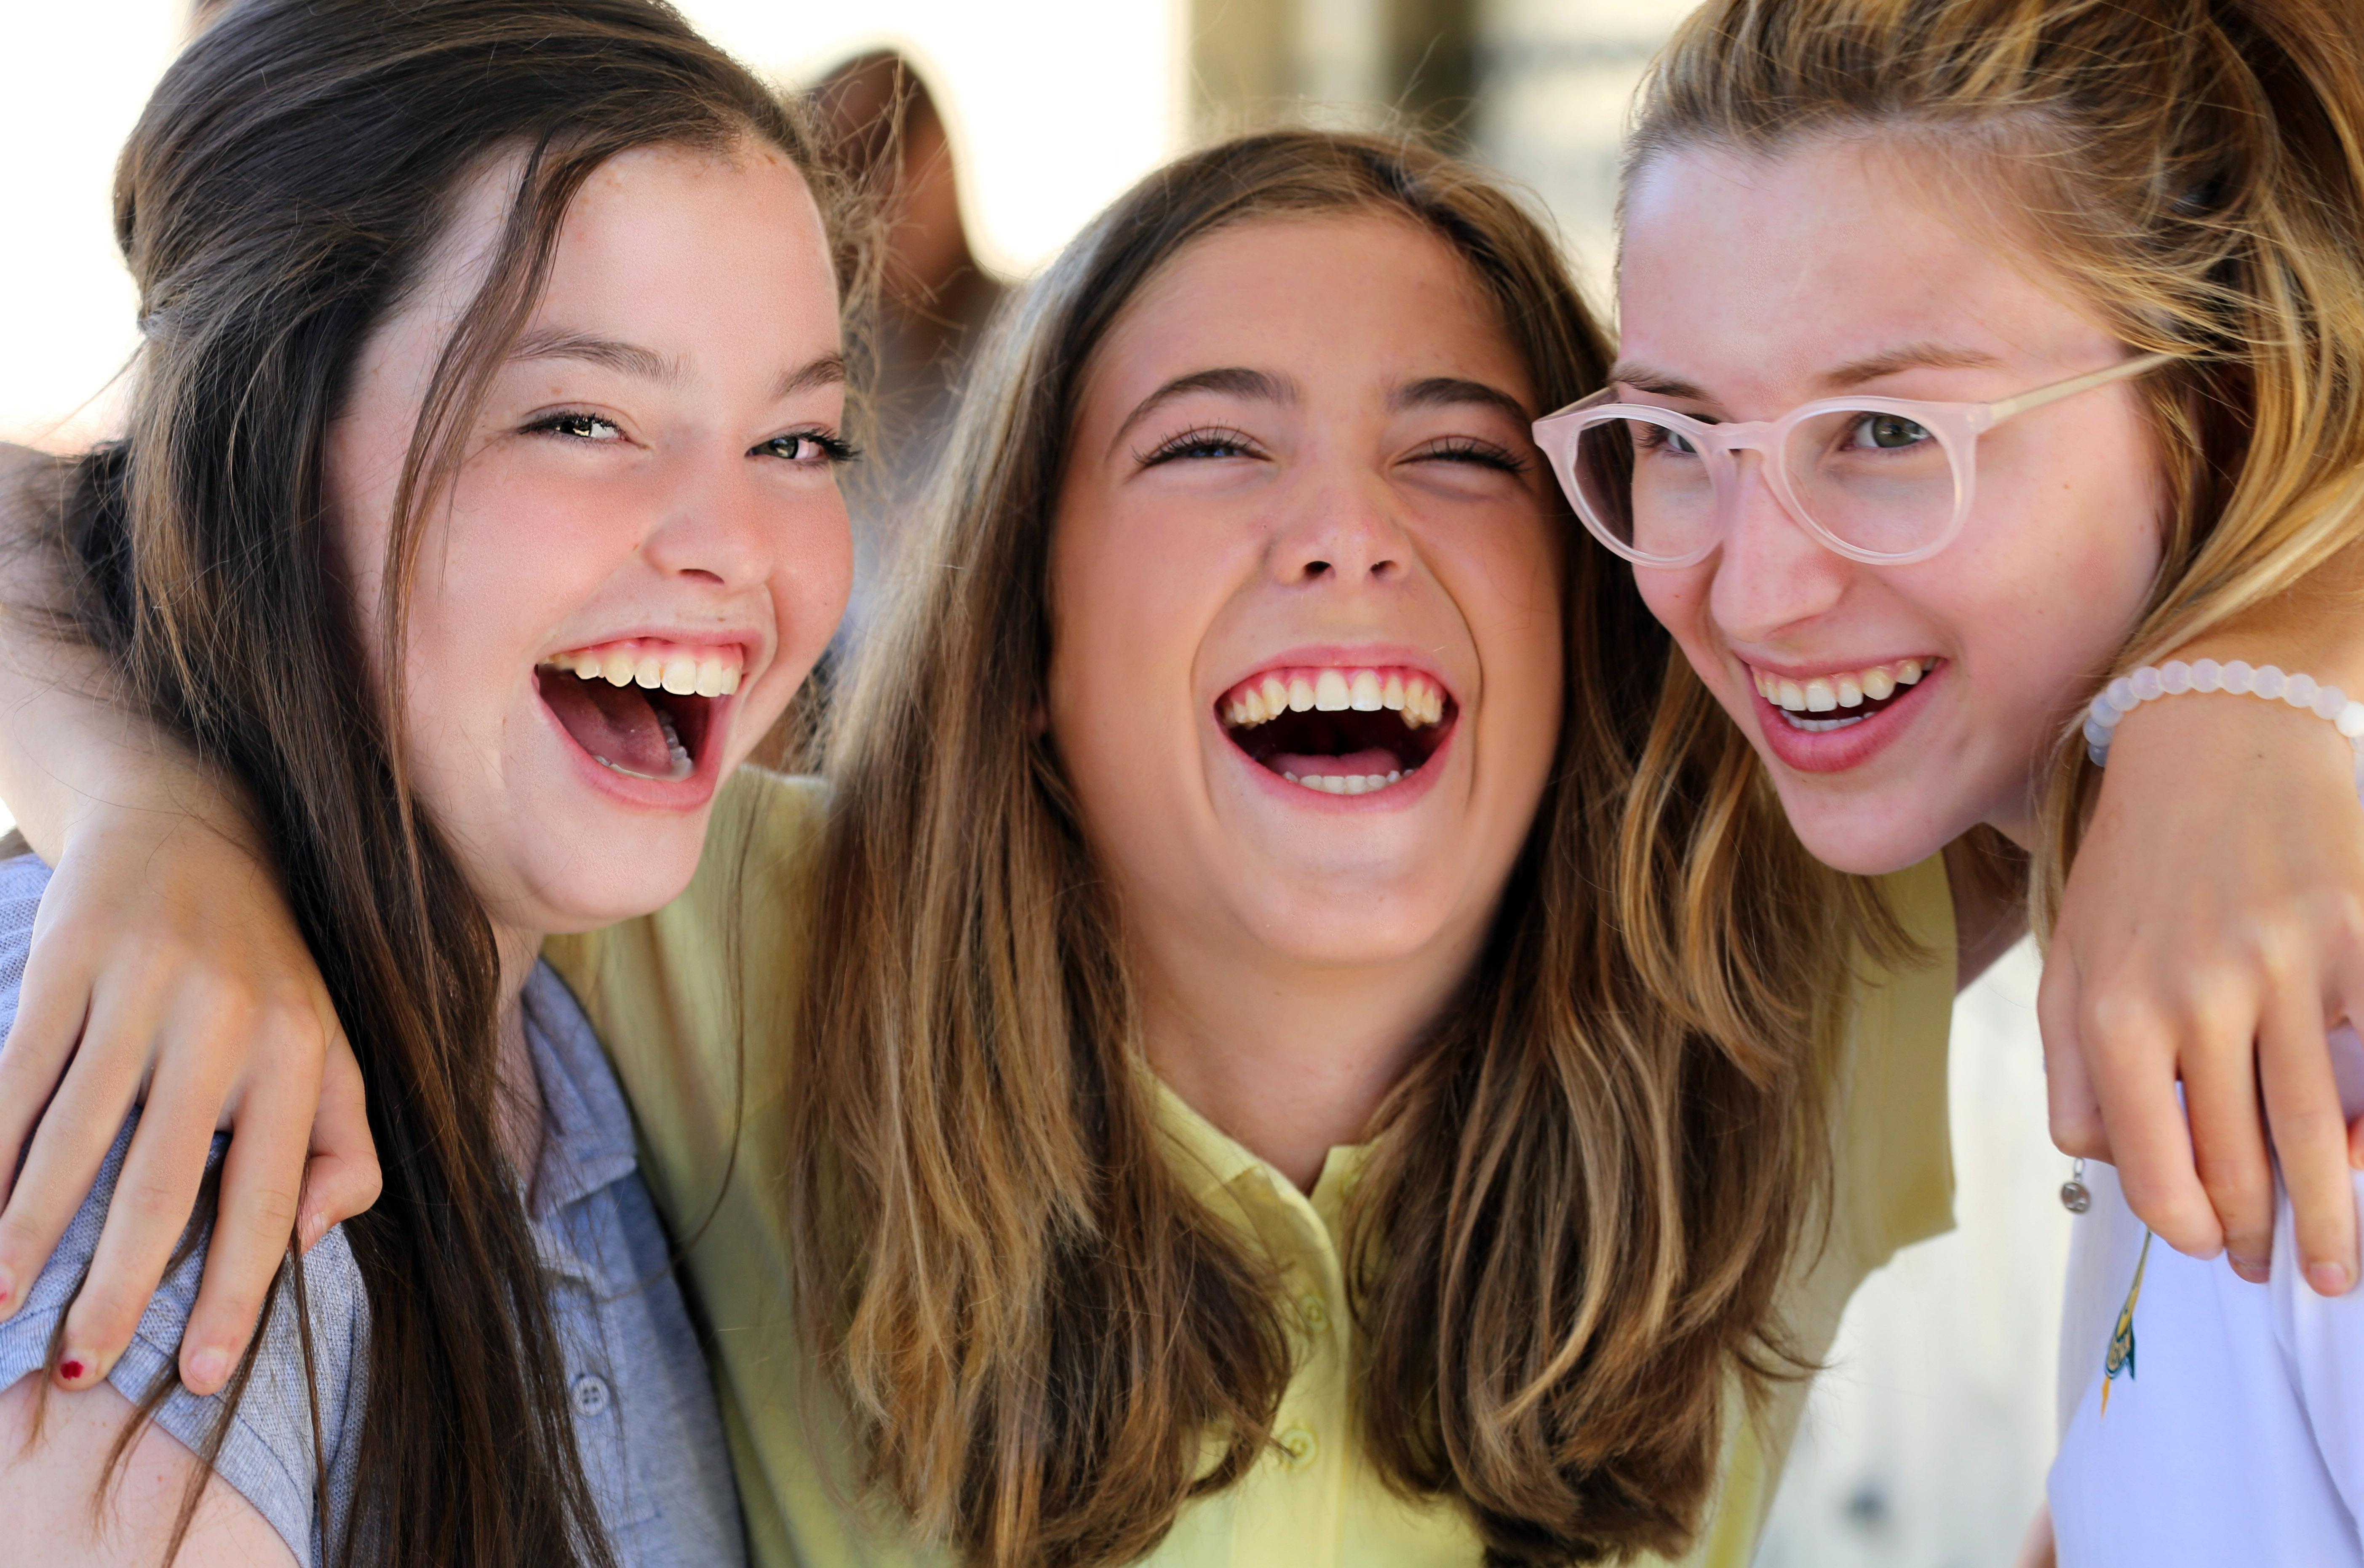 young girls who sqirt